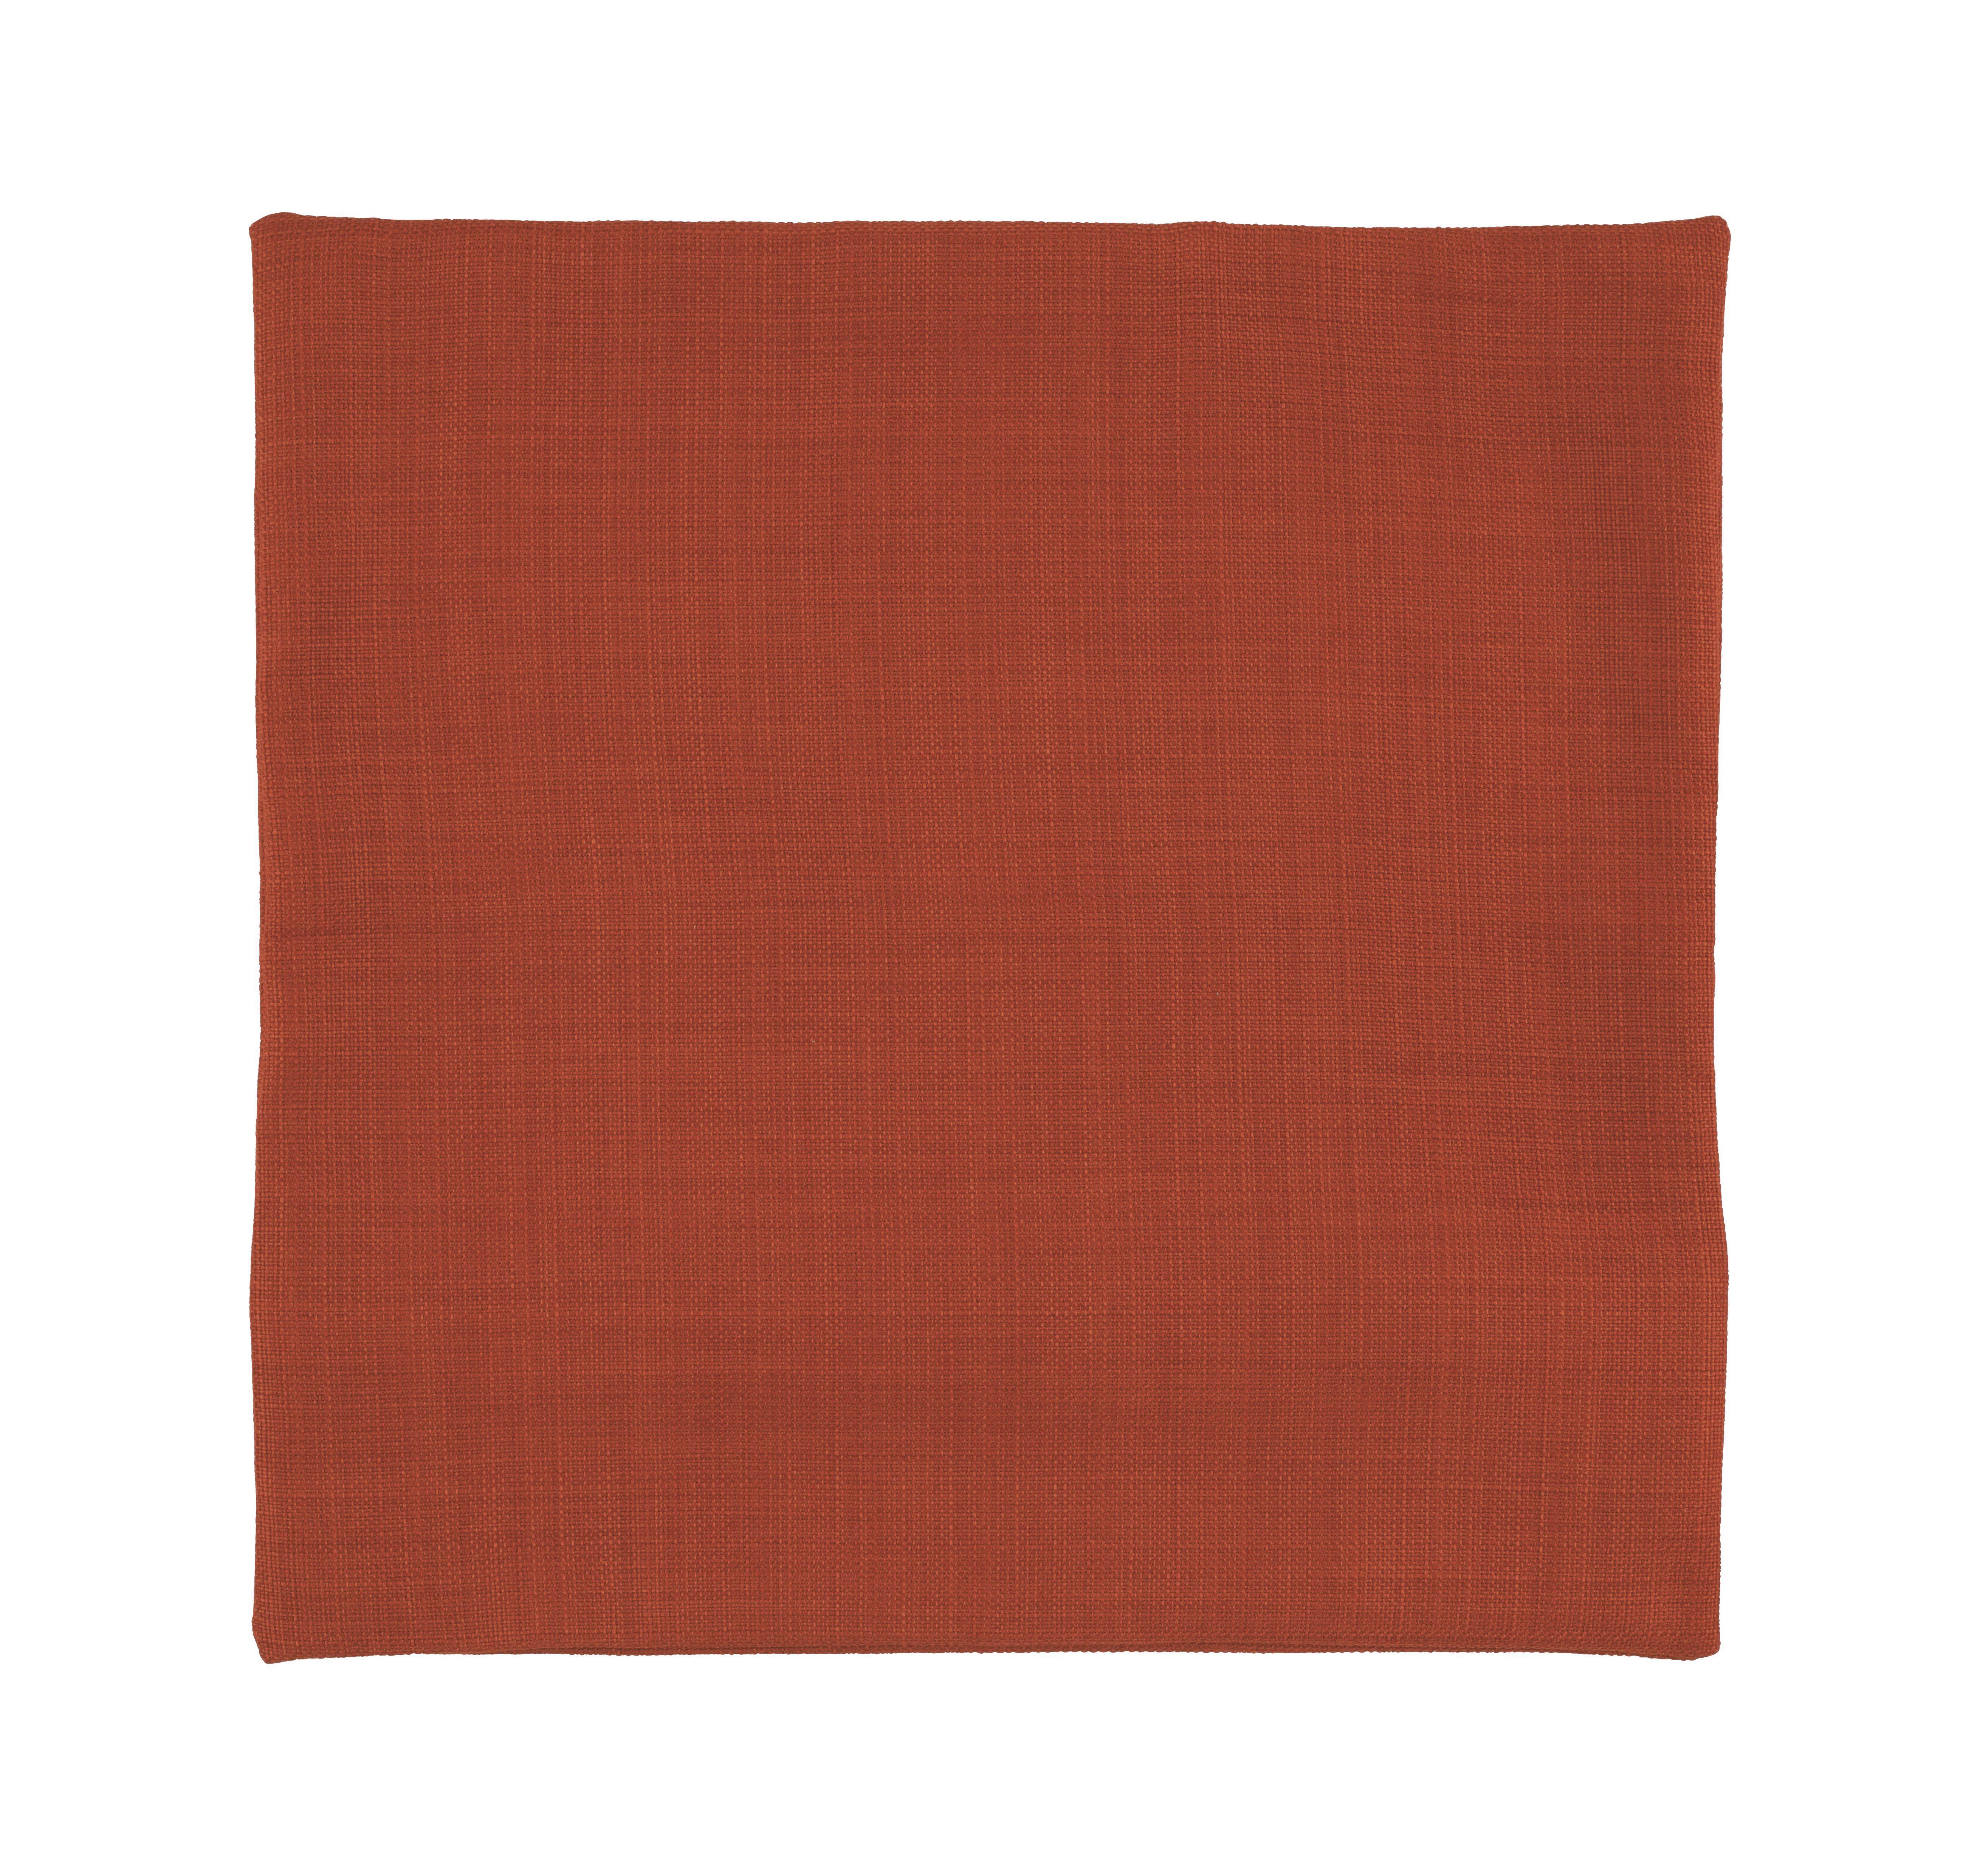 Kissenhülle Leinenoptik, ca. 40x40cm - Orange, KONVENTIONELL, Textil (40/40cm) - MÖMAX modern living